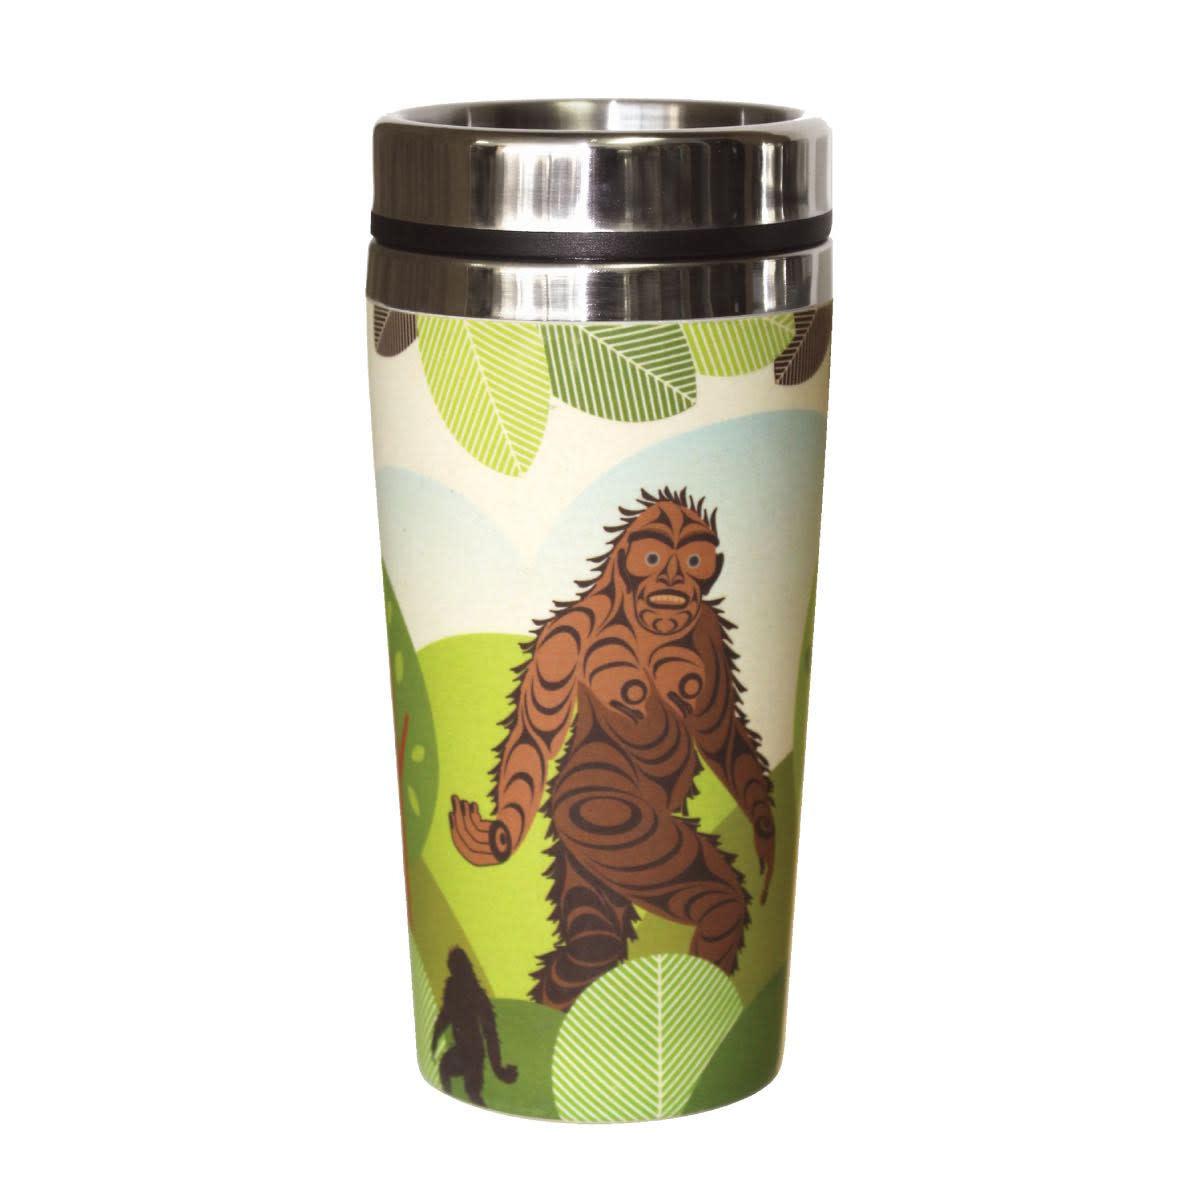 Bamboo Travel Mug - Sasquatch by Francis Horne Sr.-1